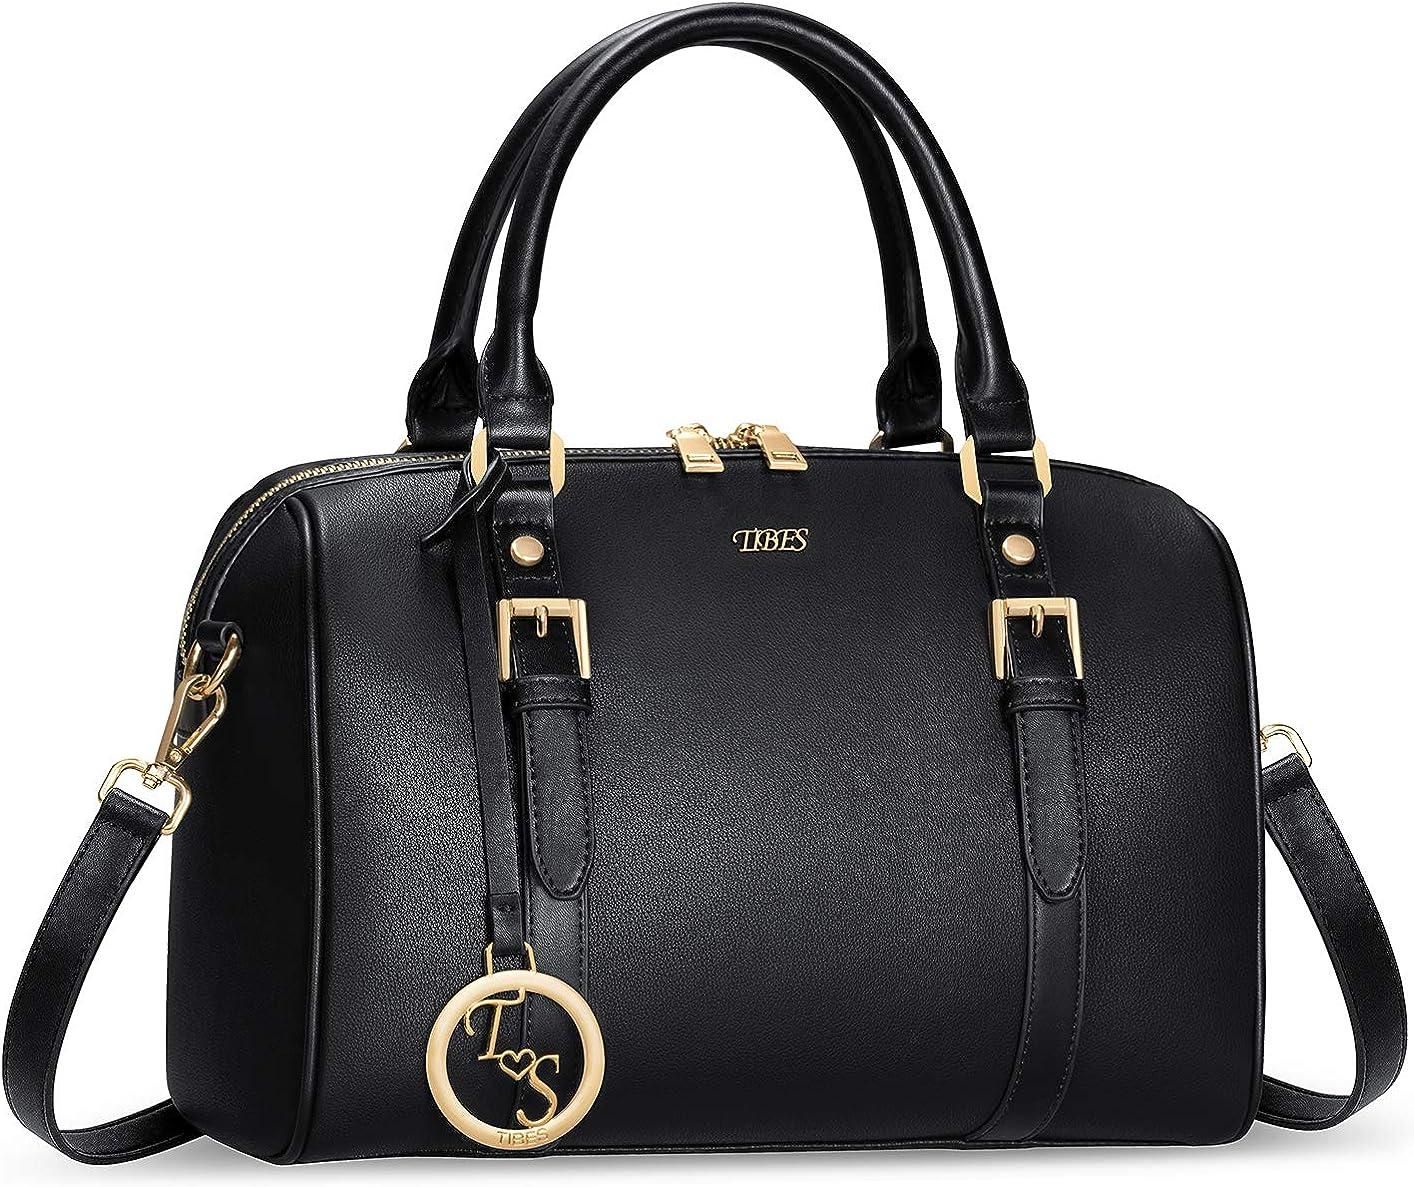 TIBES Women Handbags Purses Fashion Satchel Top Hand San Jose Mall Bags Barrel Quantity limited